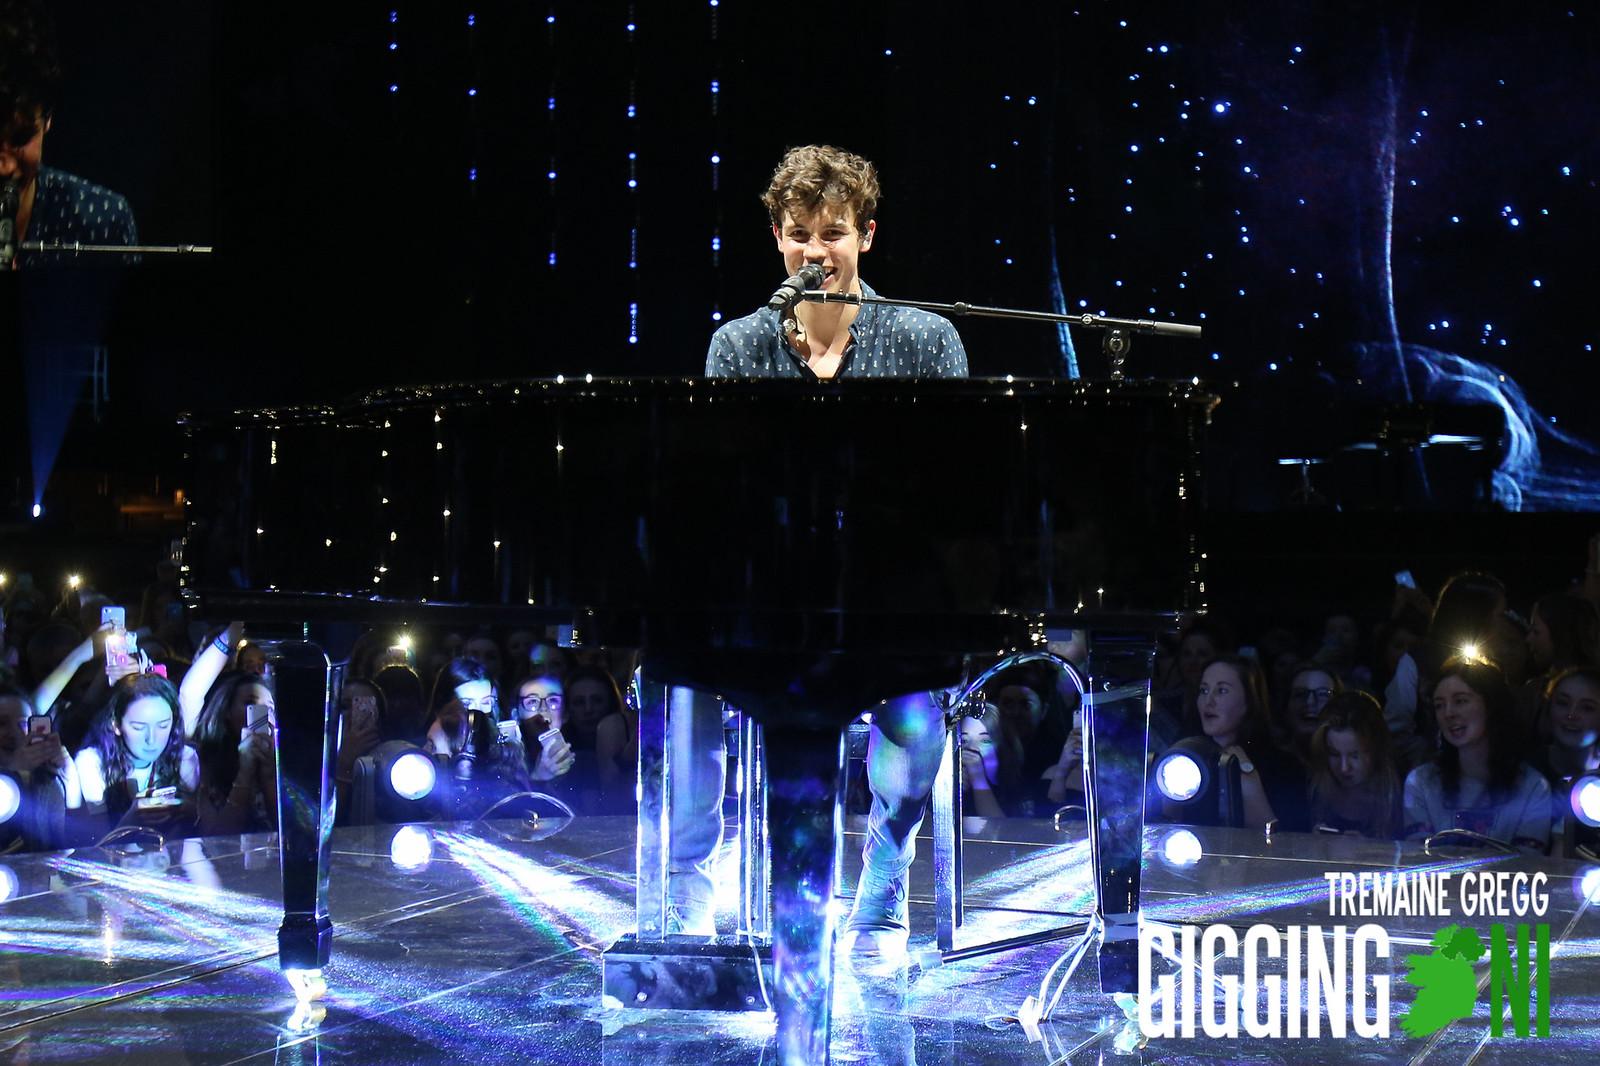 Shawn Mendes performing at 3Arena, Dublin